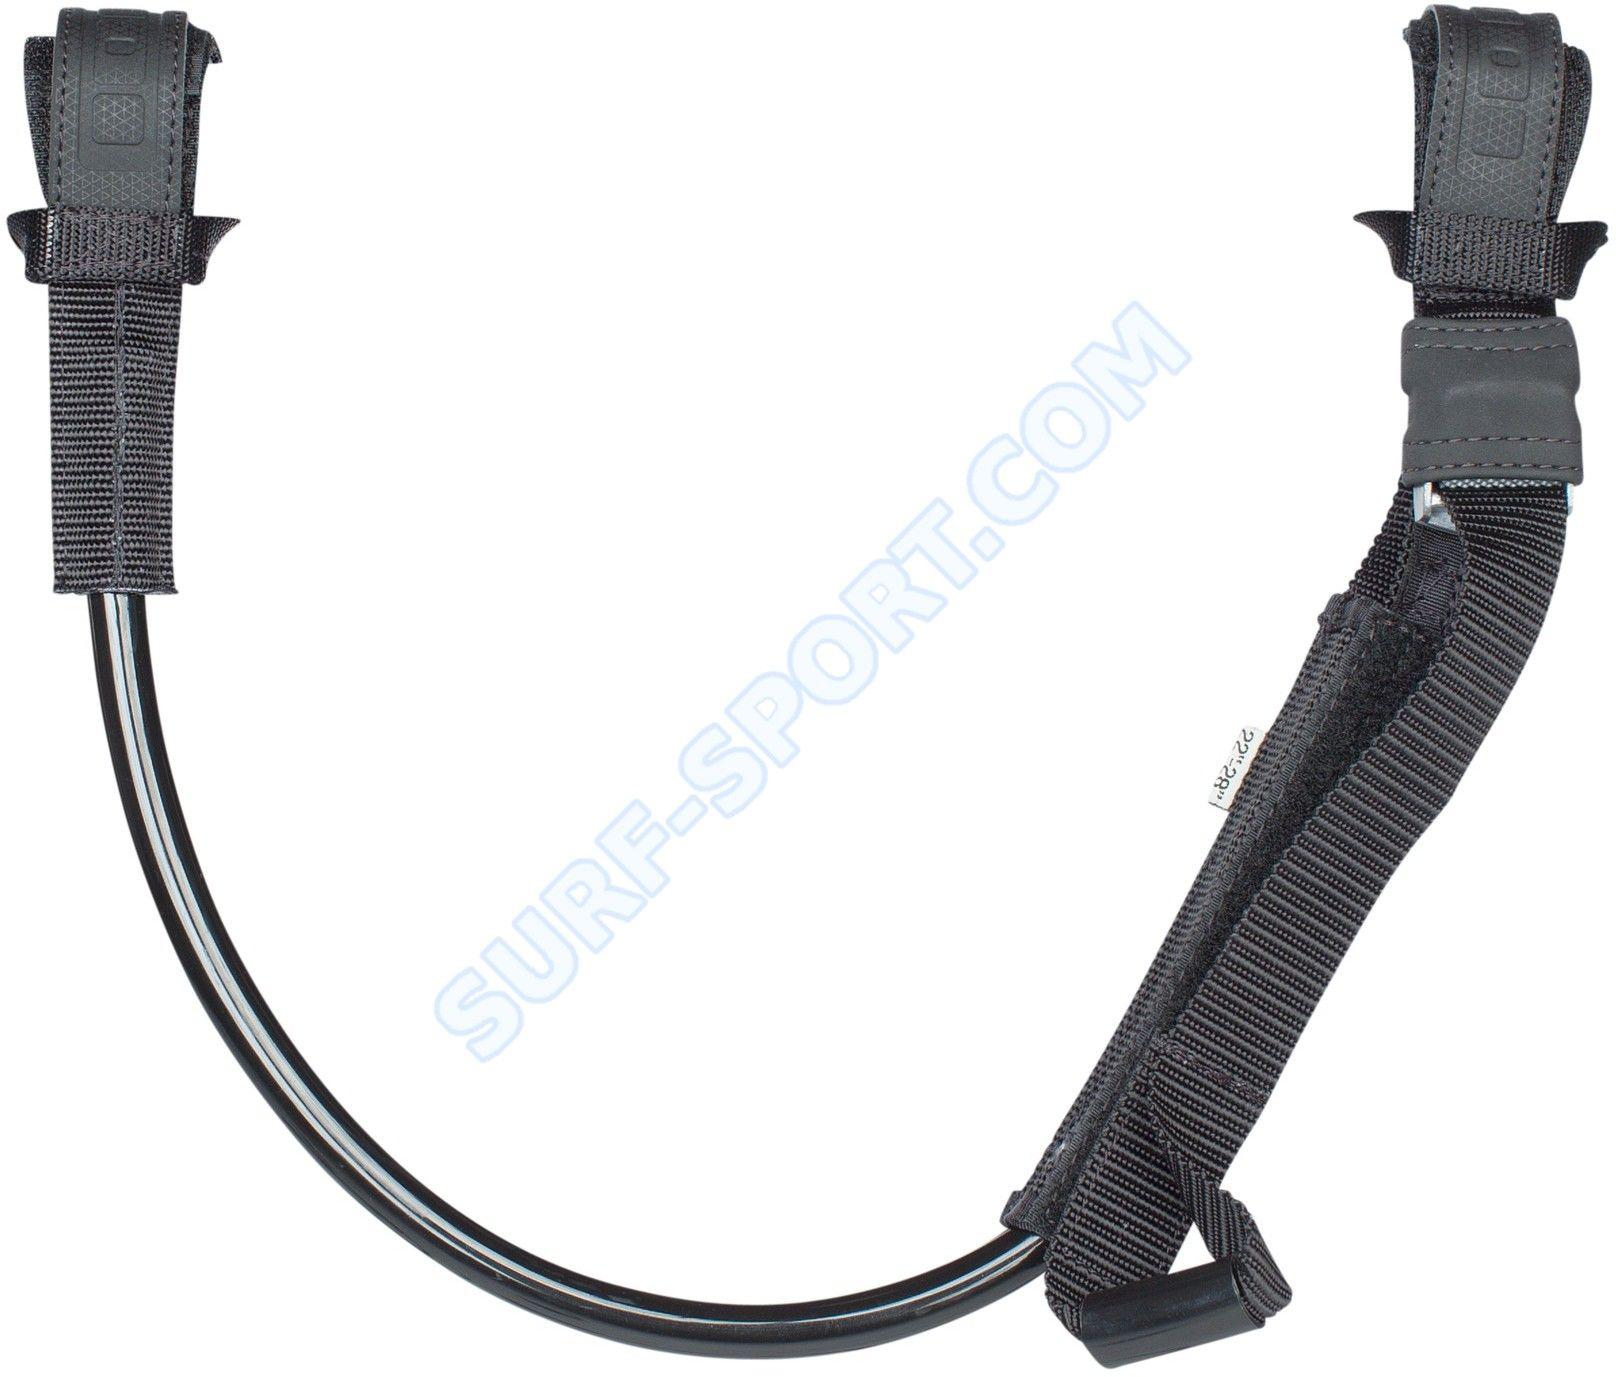 Linki Trapezowe Ion Harness Line Set Vario 2020-Black